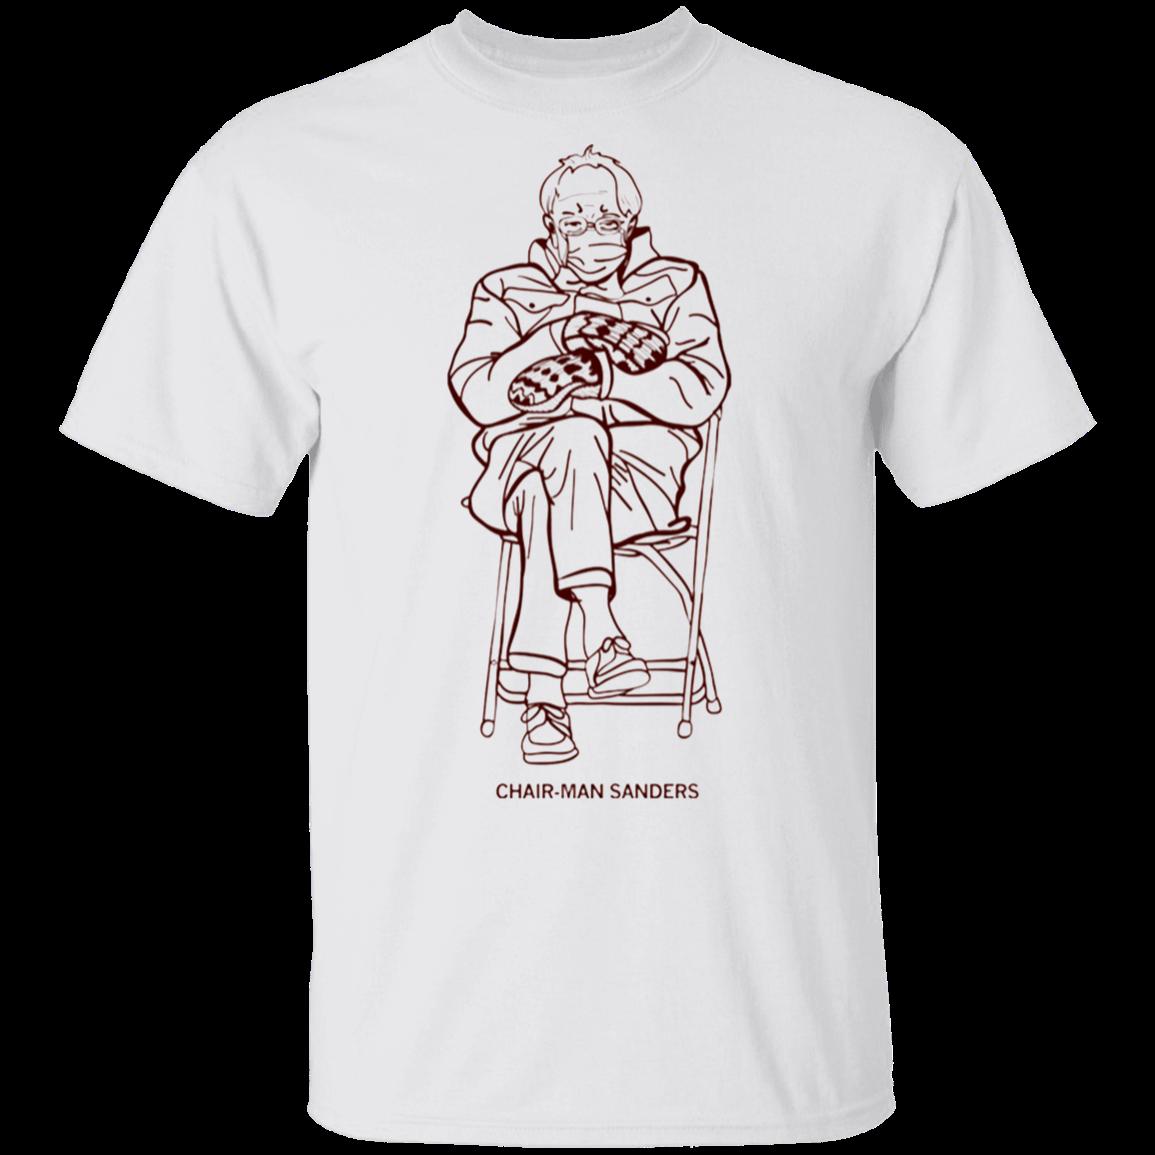 Bernie Sanders Mittens T Shirt Chairman Sanders Crewneck Bernie Meme Shirt Men Women In 2021 Meme Shirt Mens Shirts Tshirt Print